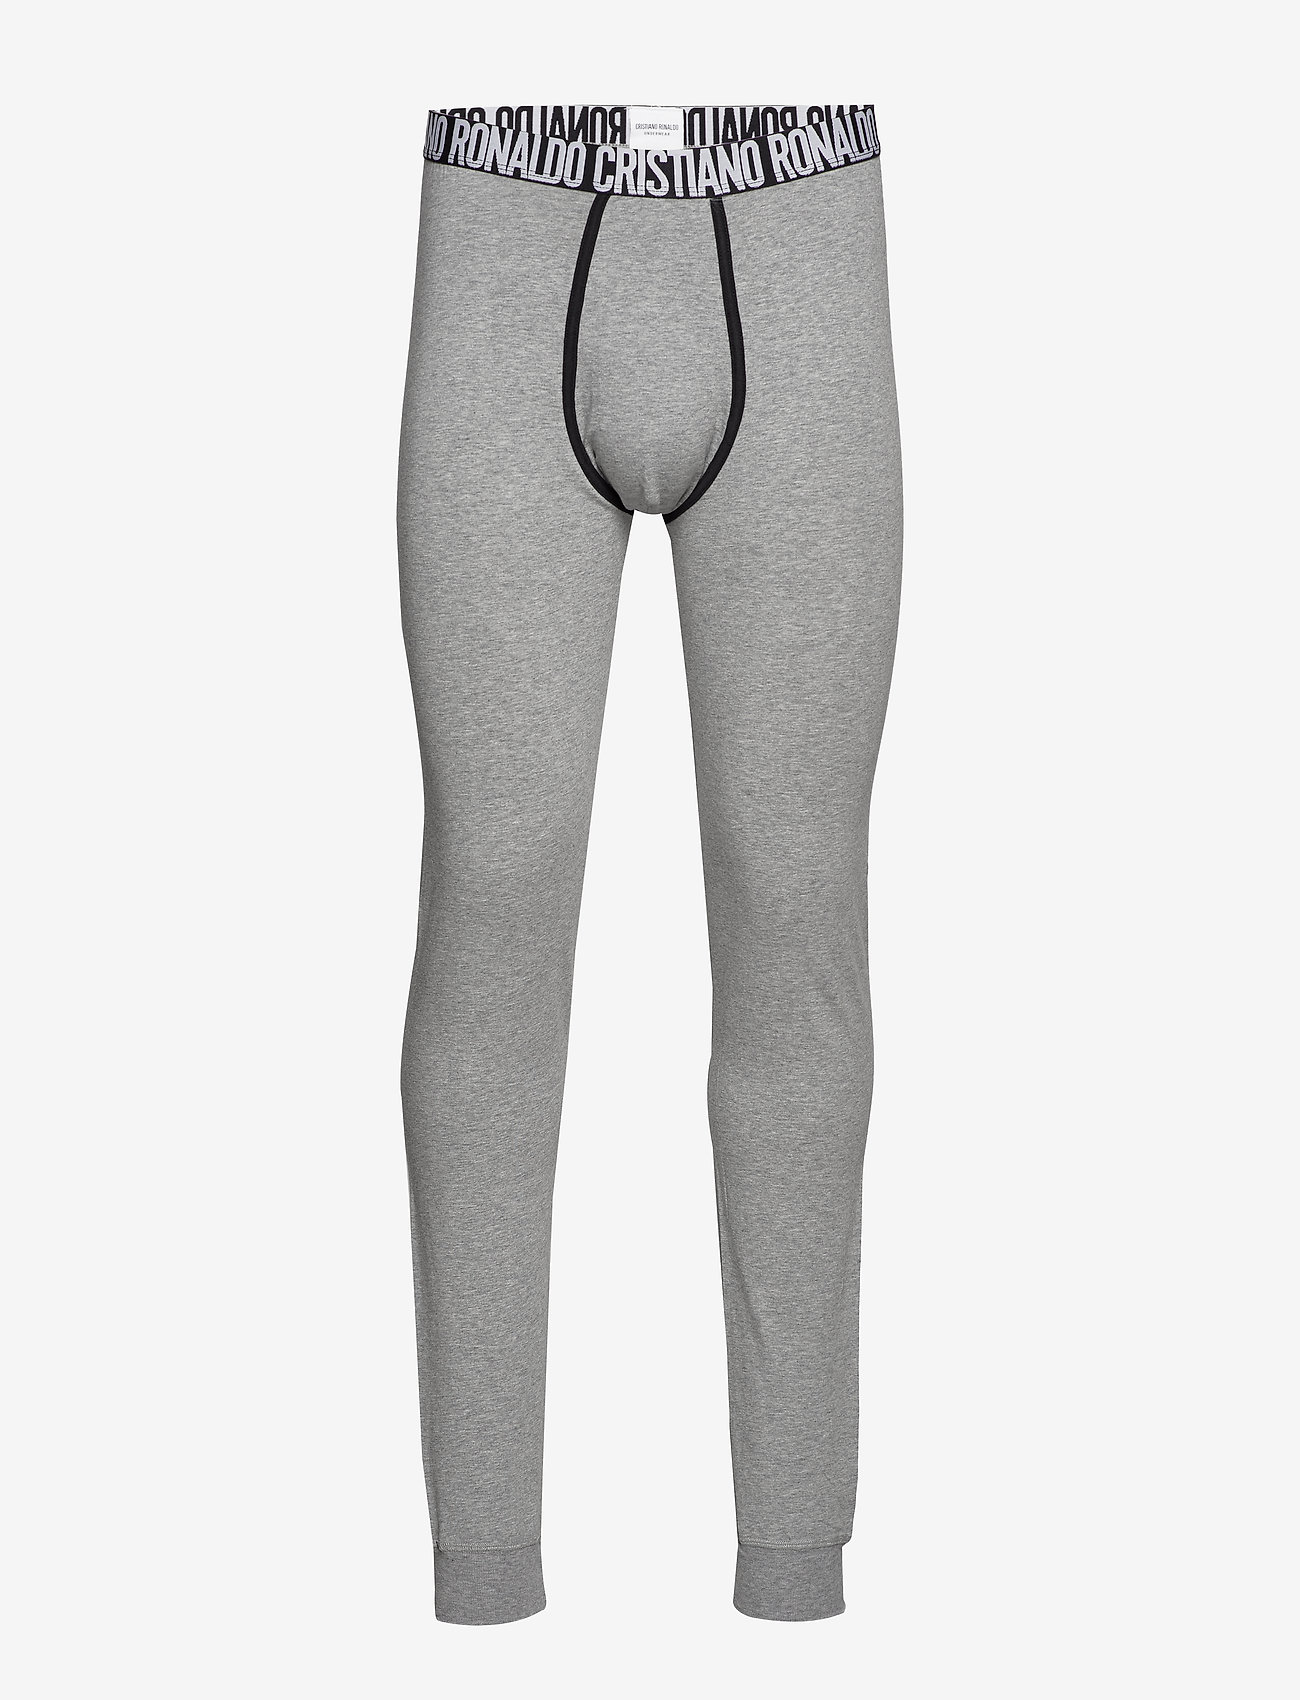 CR7 - CR7 Fashion, Long Johns - bottoms - grey - 0